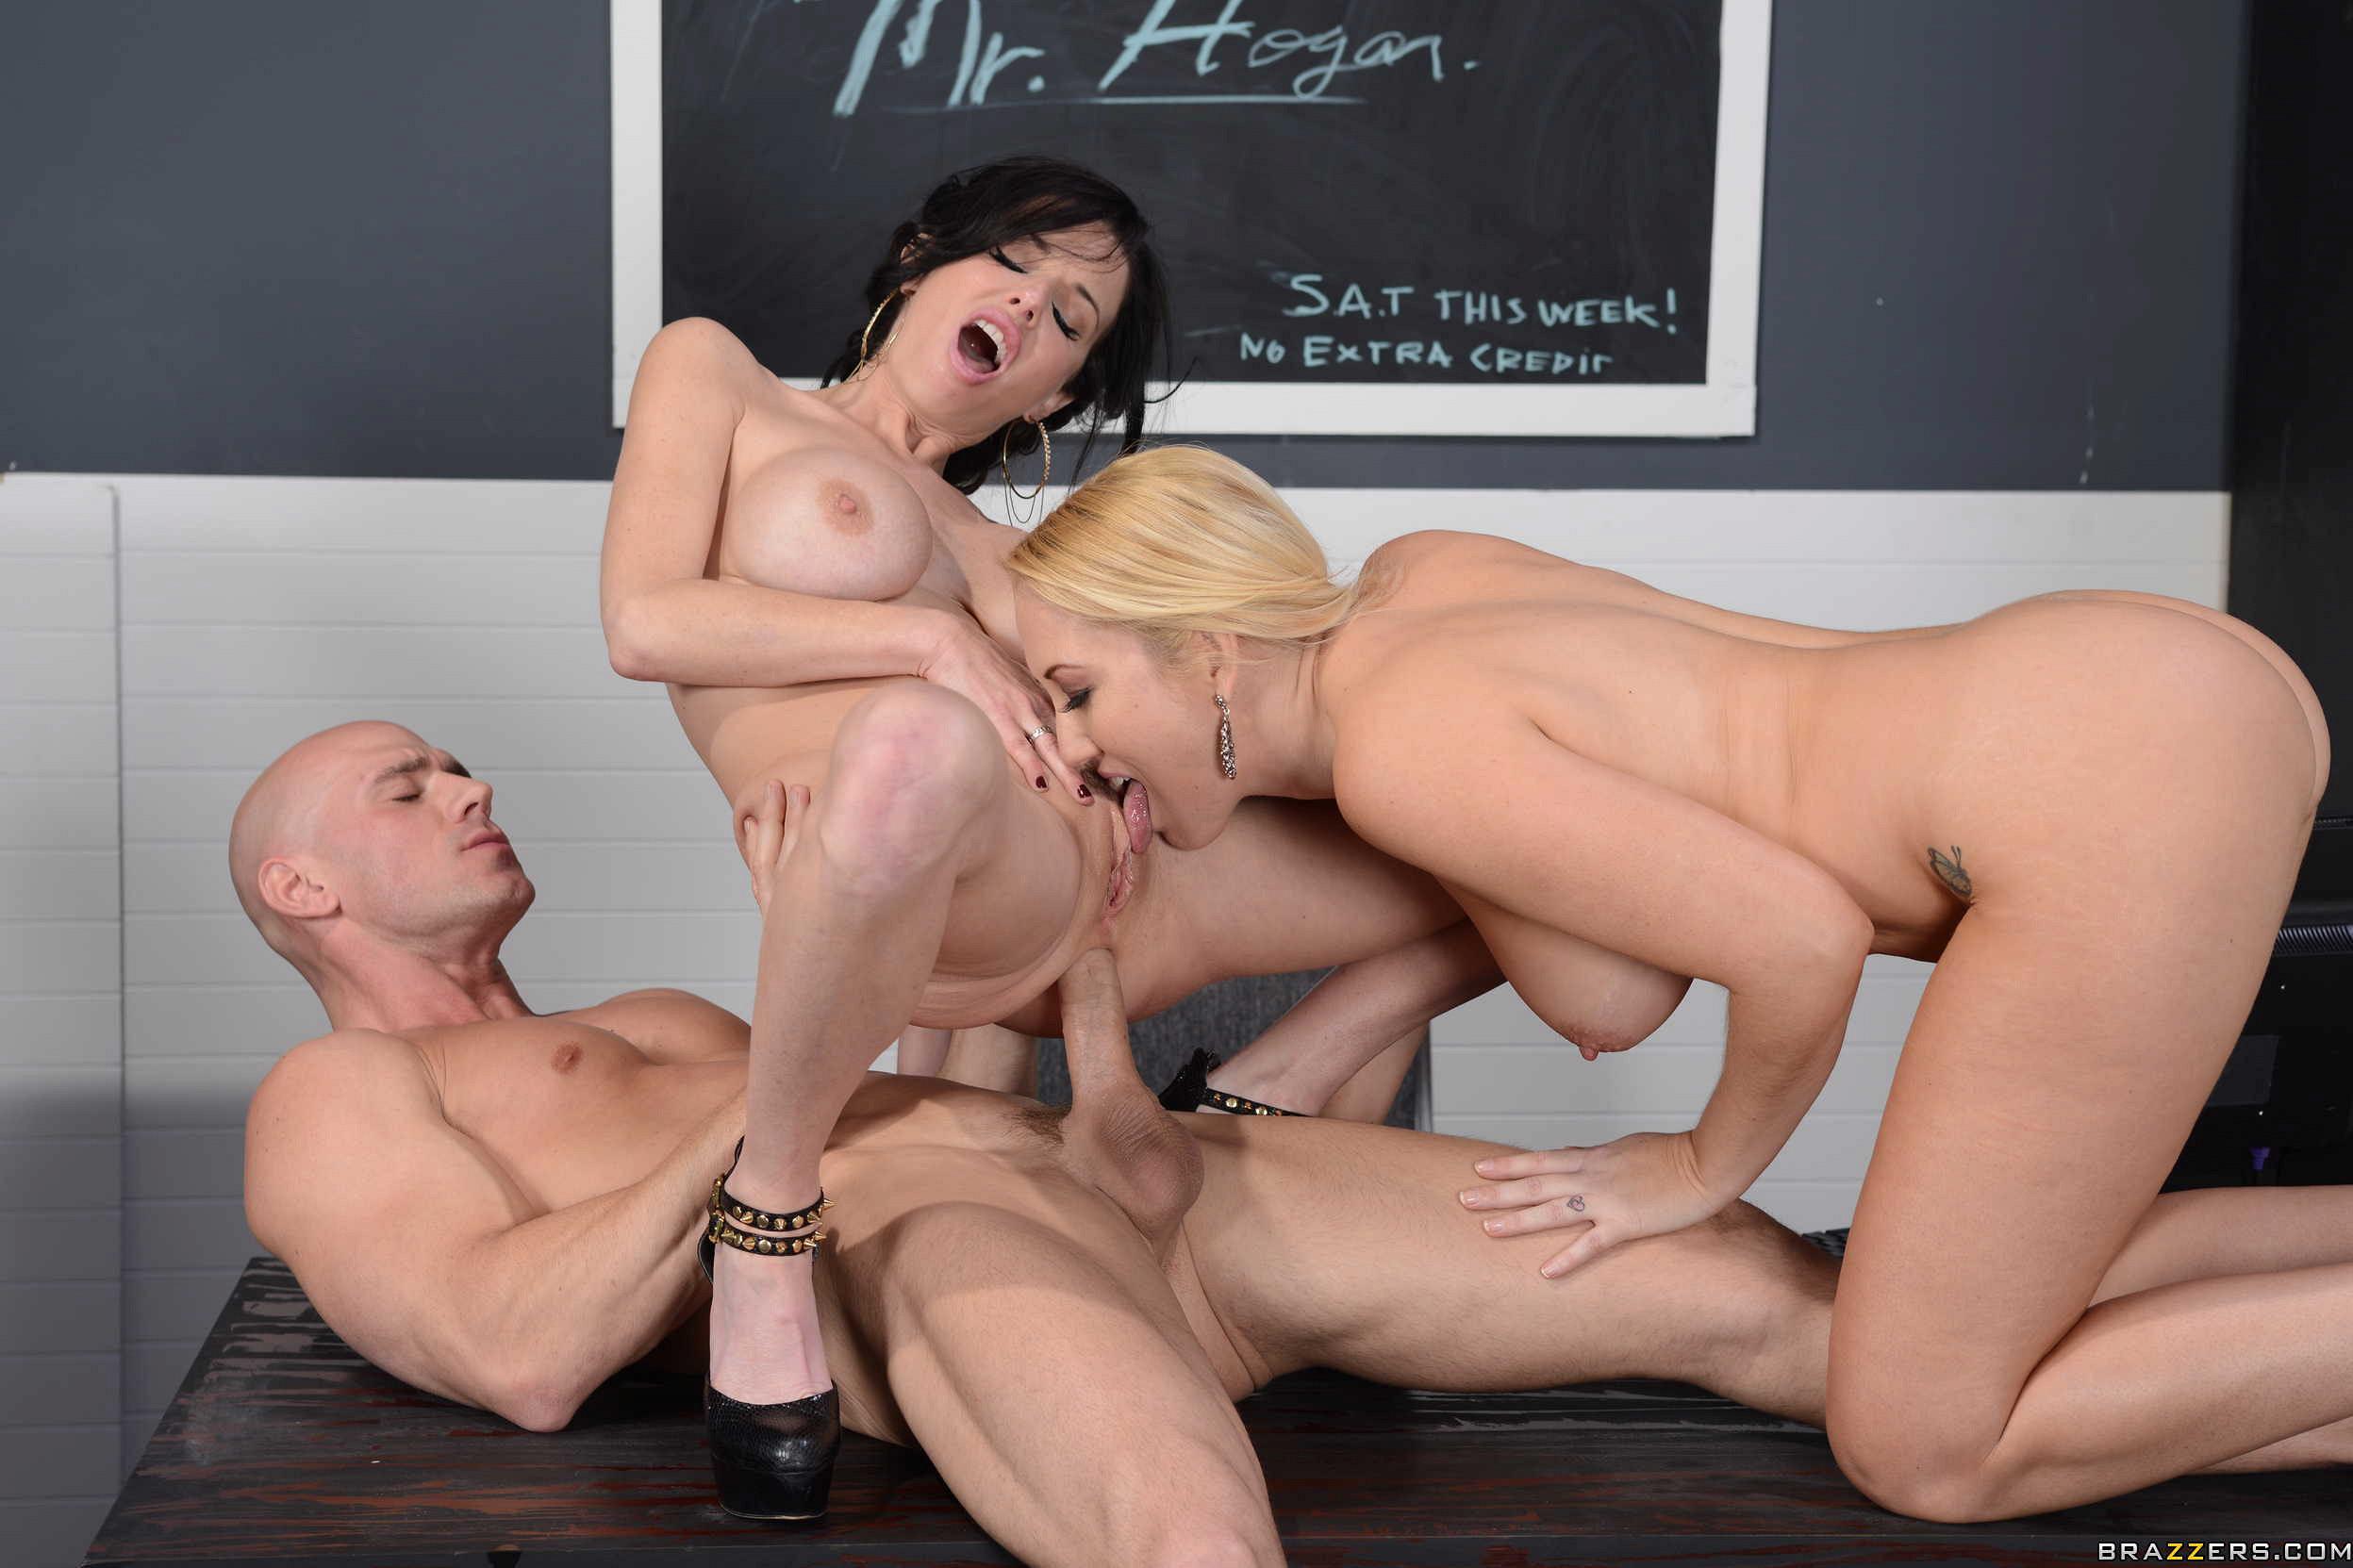 Секс порно онлайн brazzers, Смотреть порно Бразерс (Brazzers) в HD качестве онлайн 12 фотография